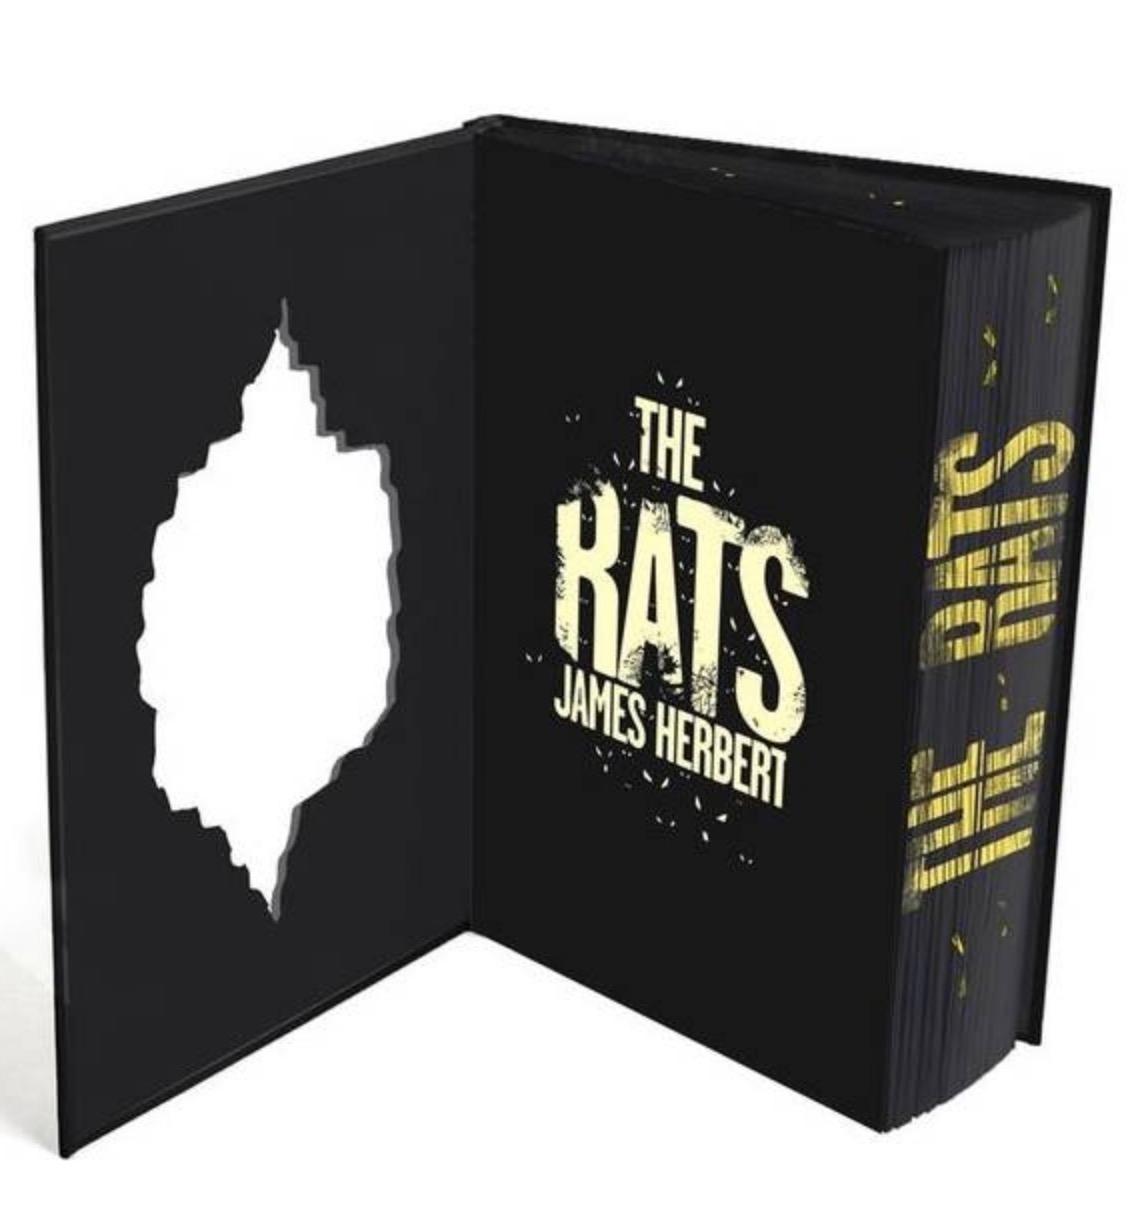 James Herbert The Rats sprayed edges